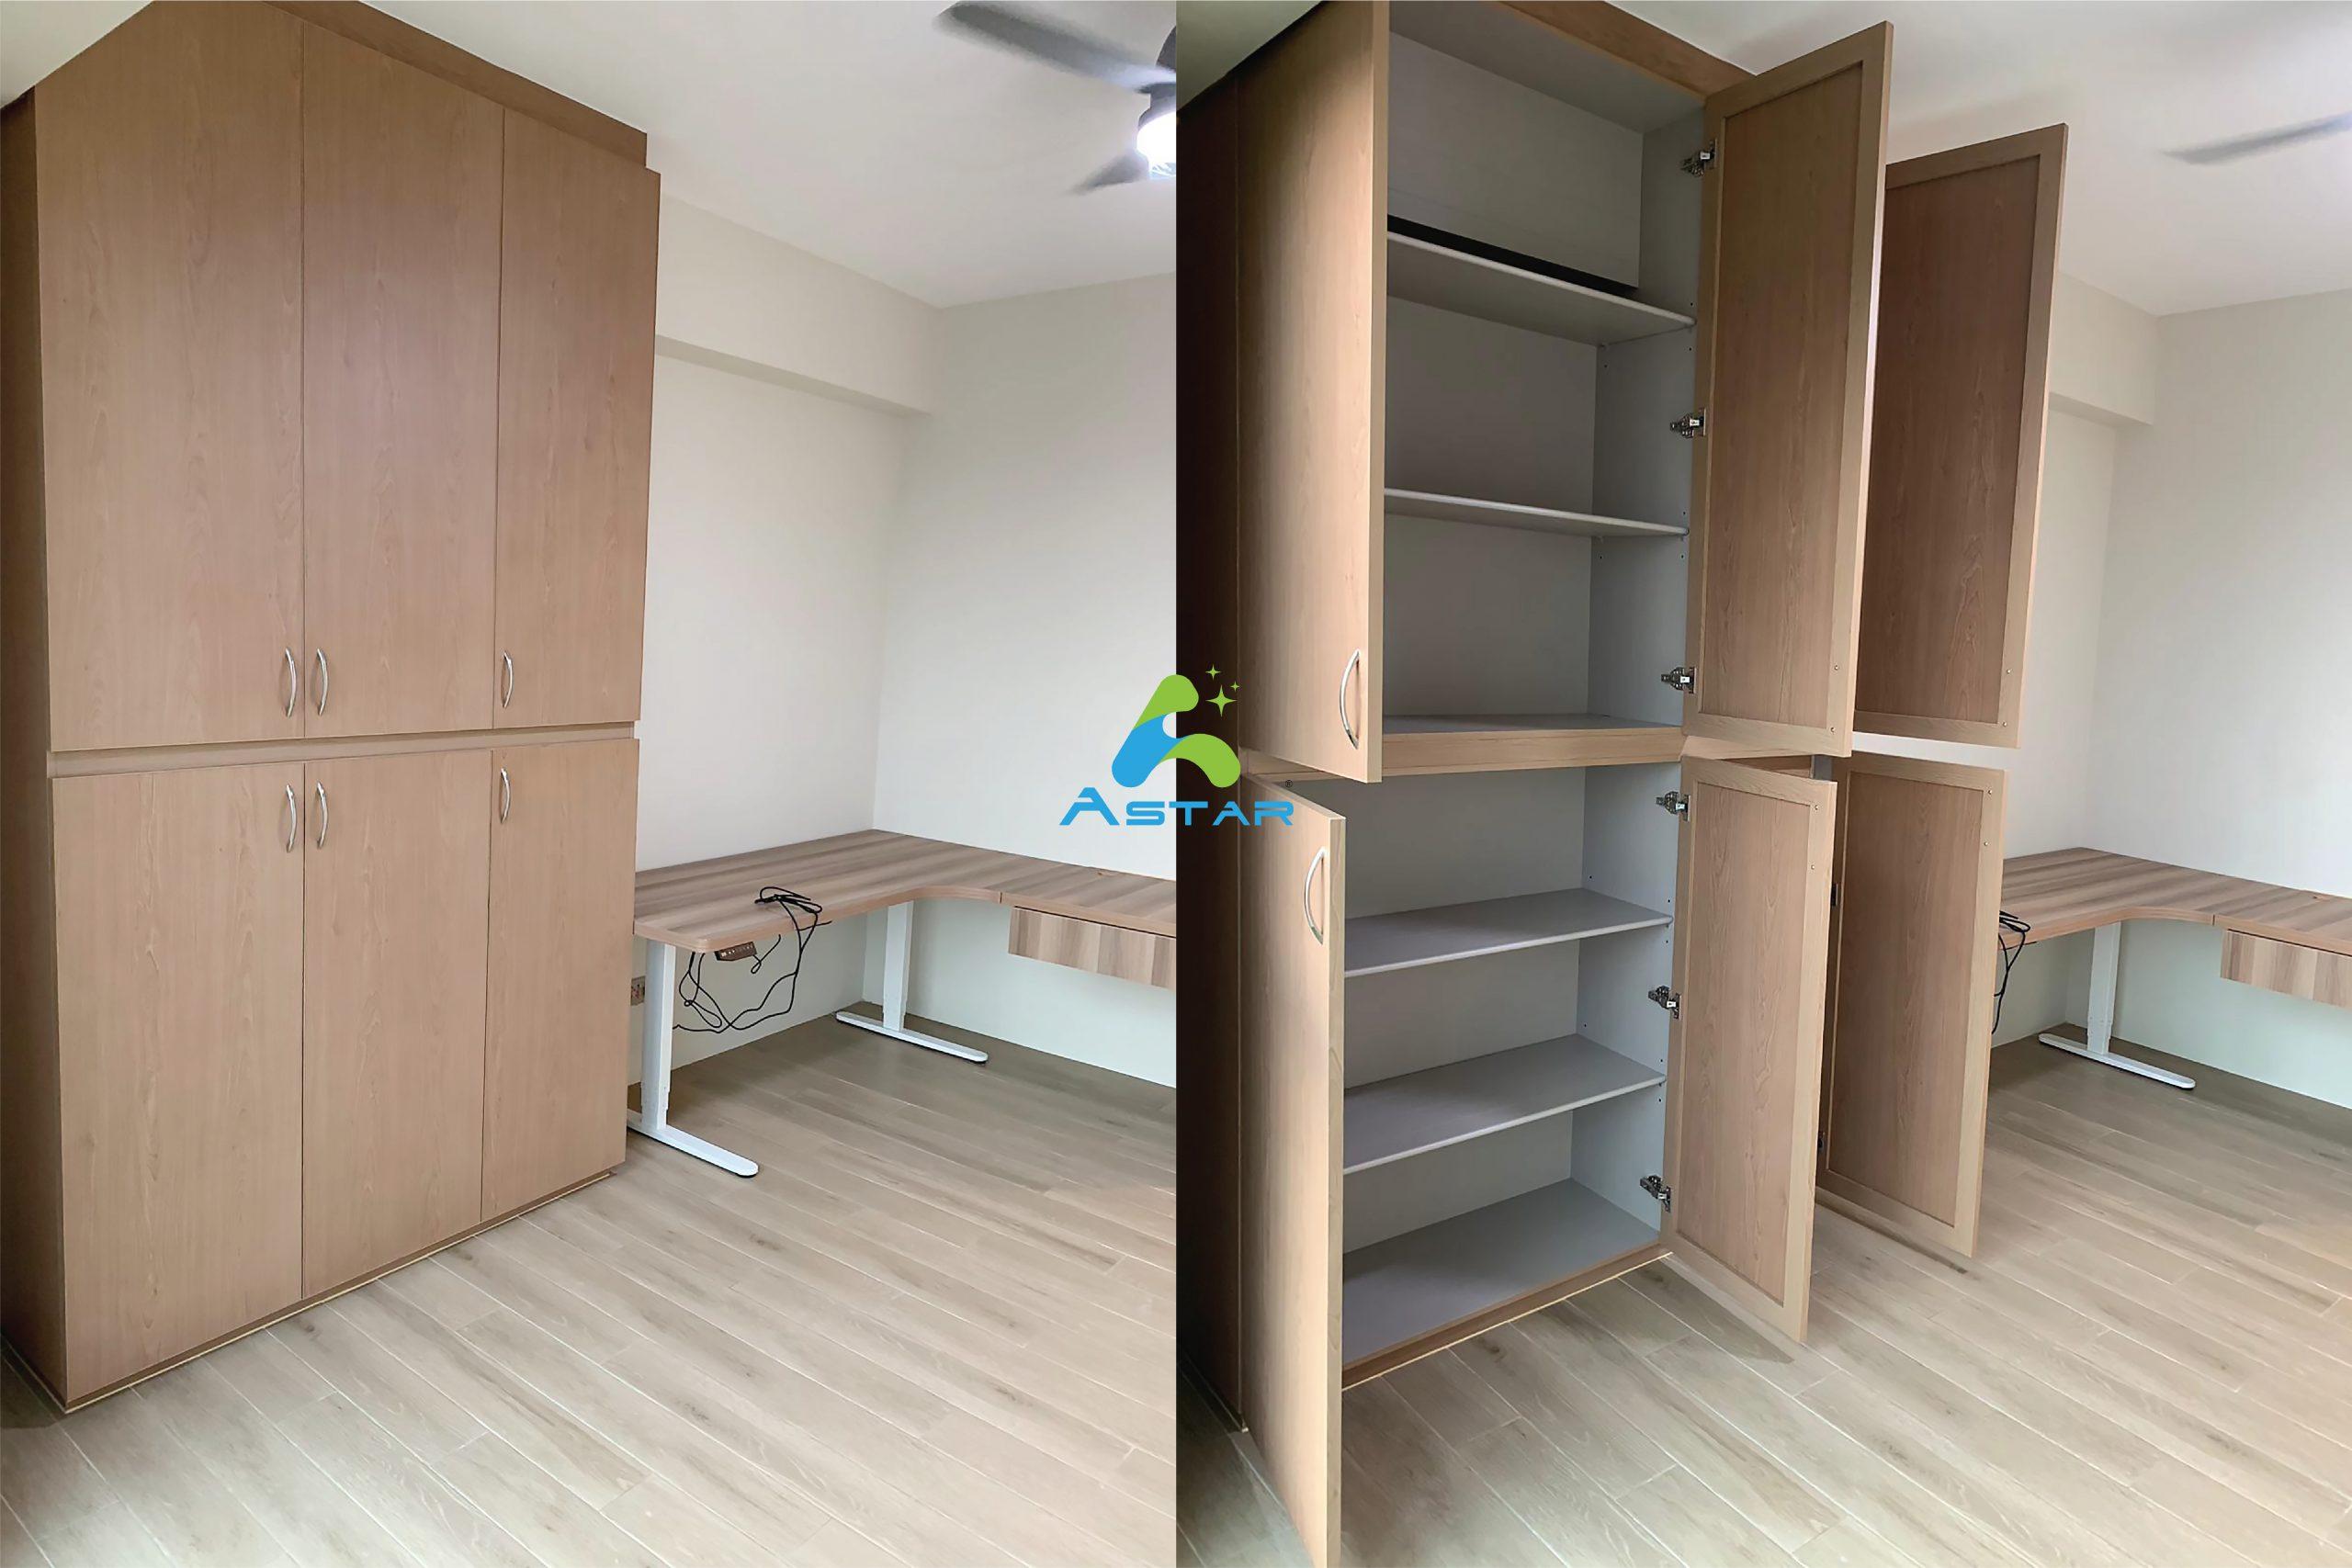 astar furnishing aluminum furniture projects Yew Mei Green Condominium 13